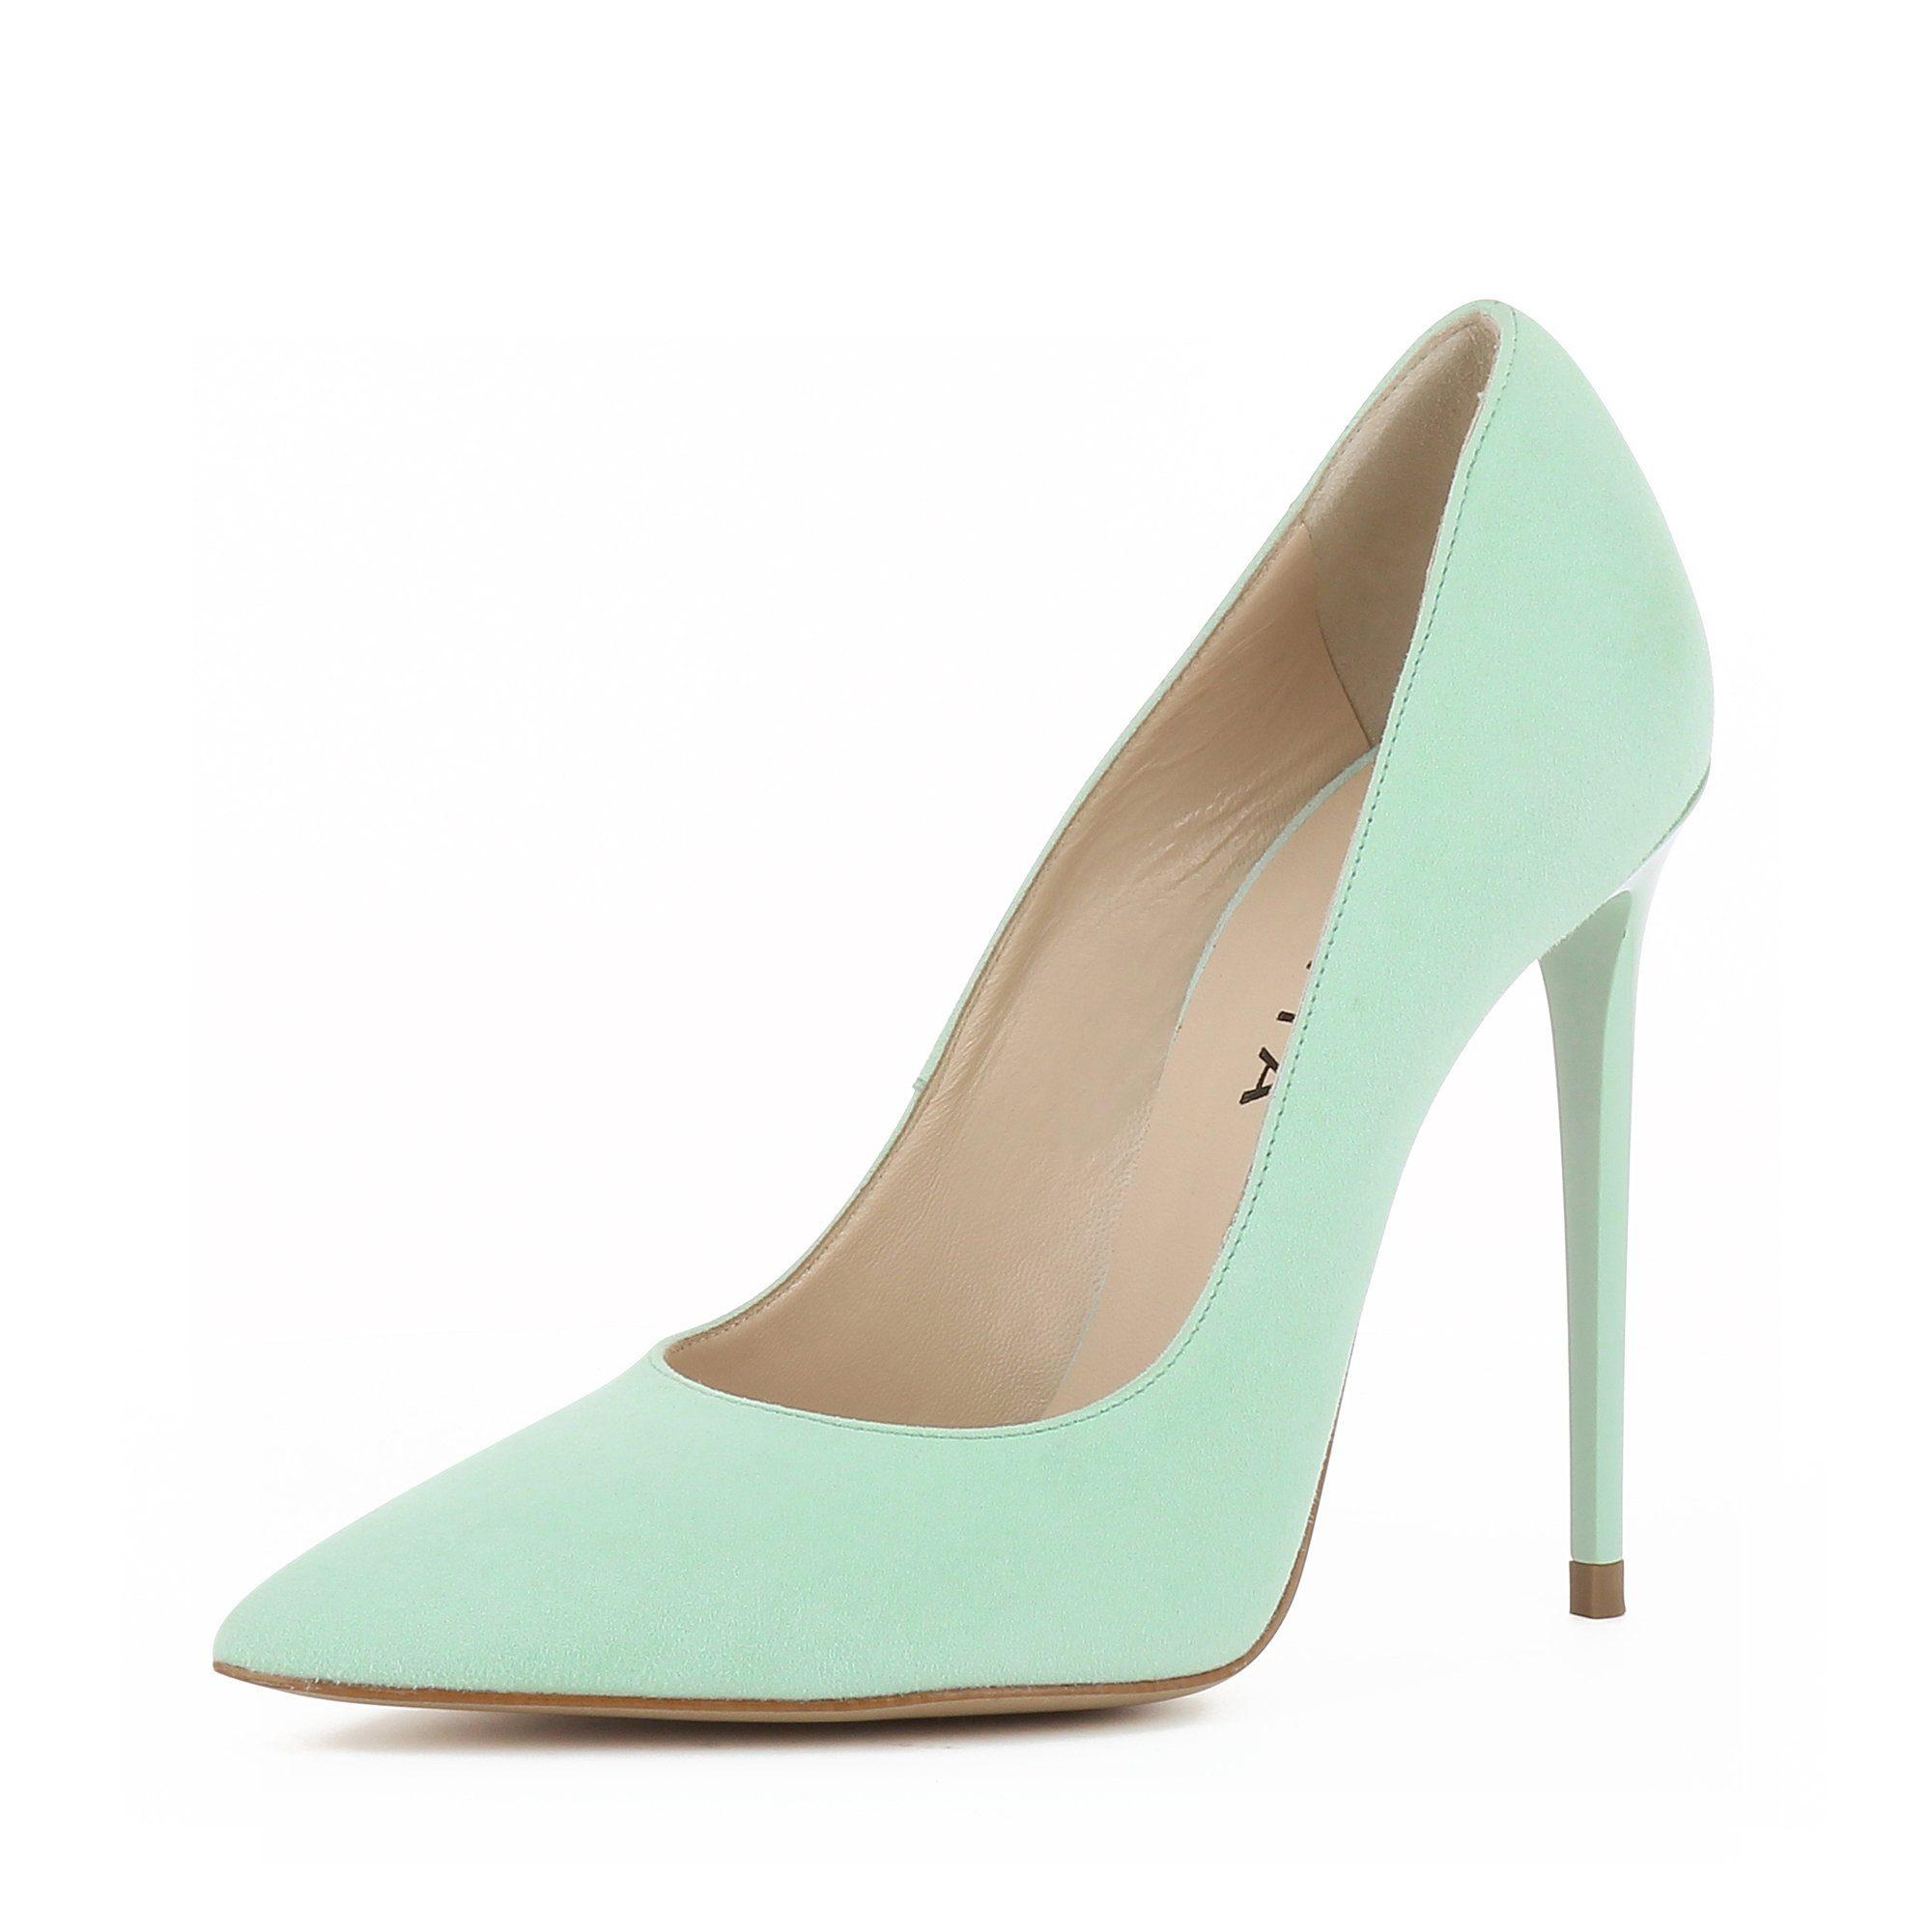 High Online Heel Evita KaufenOtto Pumps »lisa« l35uK1JFcT